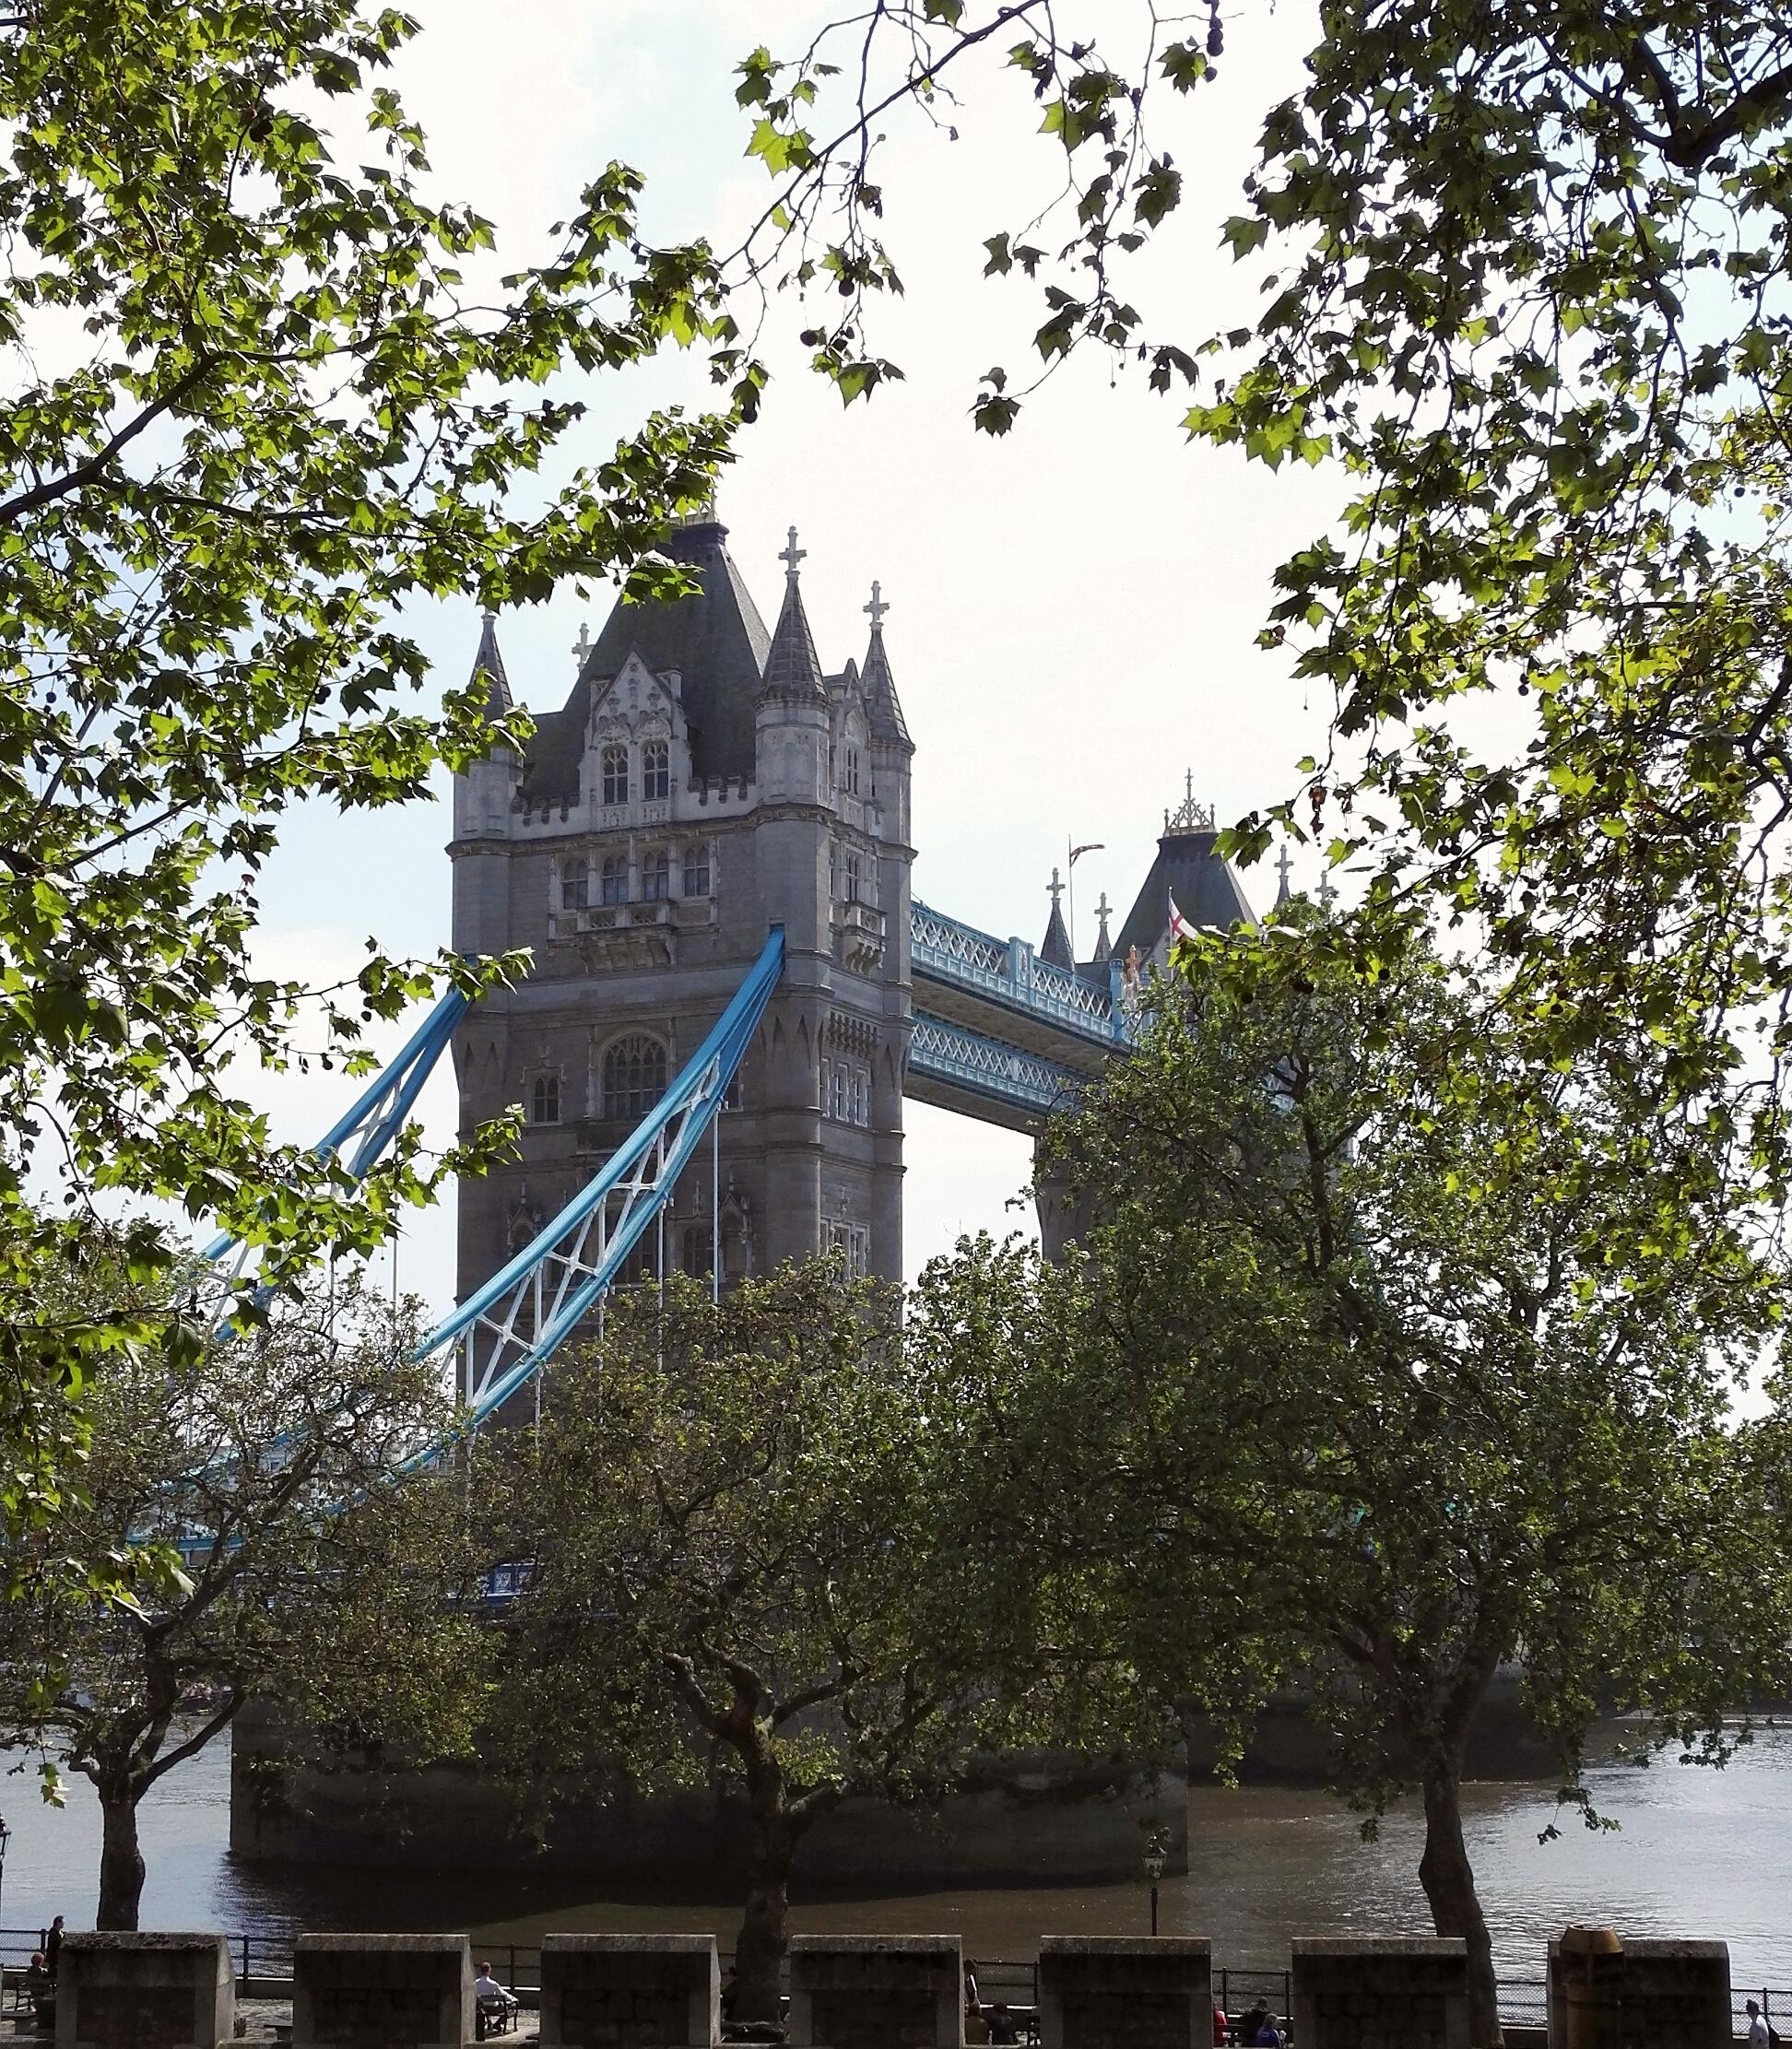 lontoo tower bridge